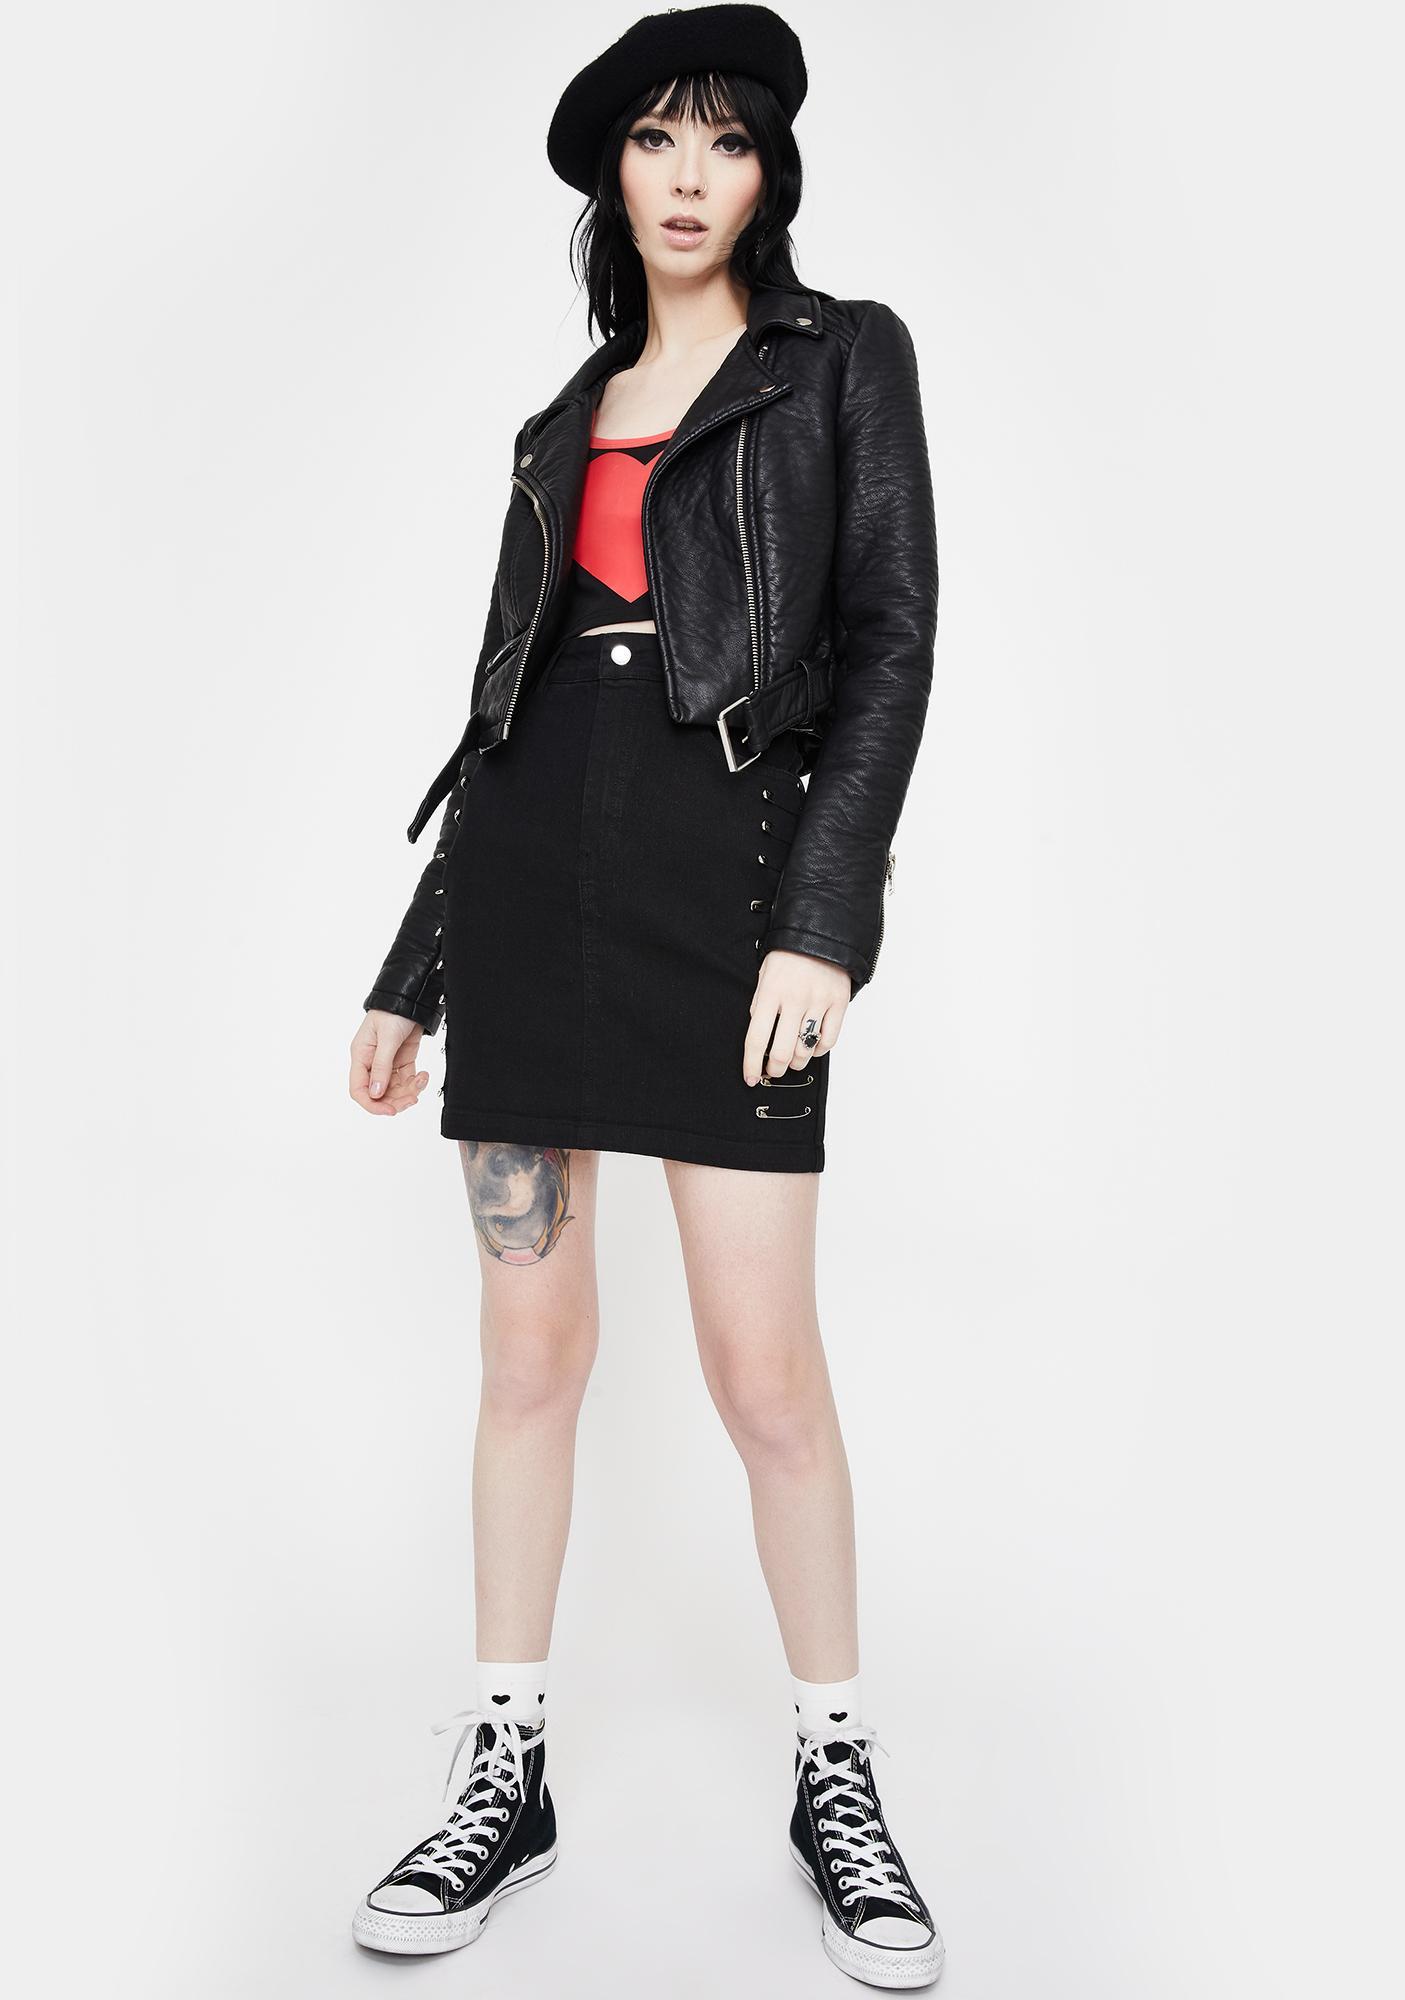 Jawbreaker Pins And Needles Denim Skirt